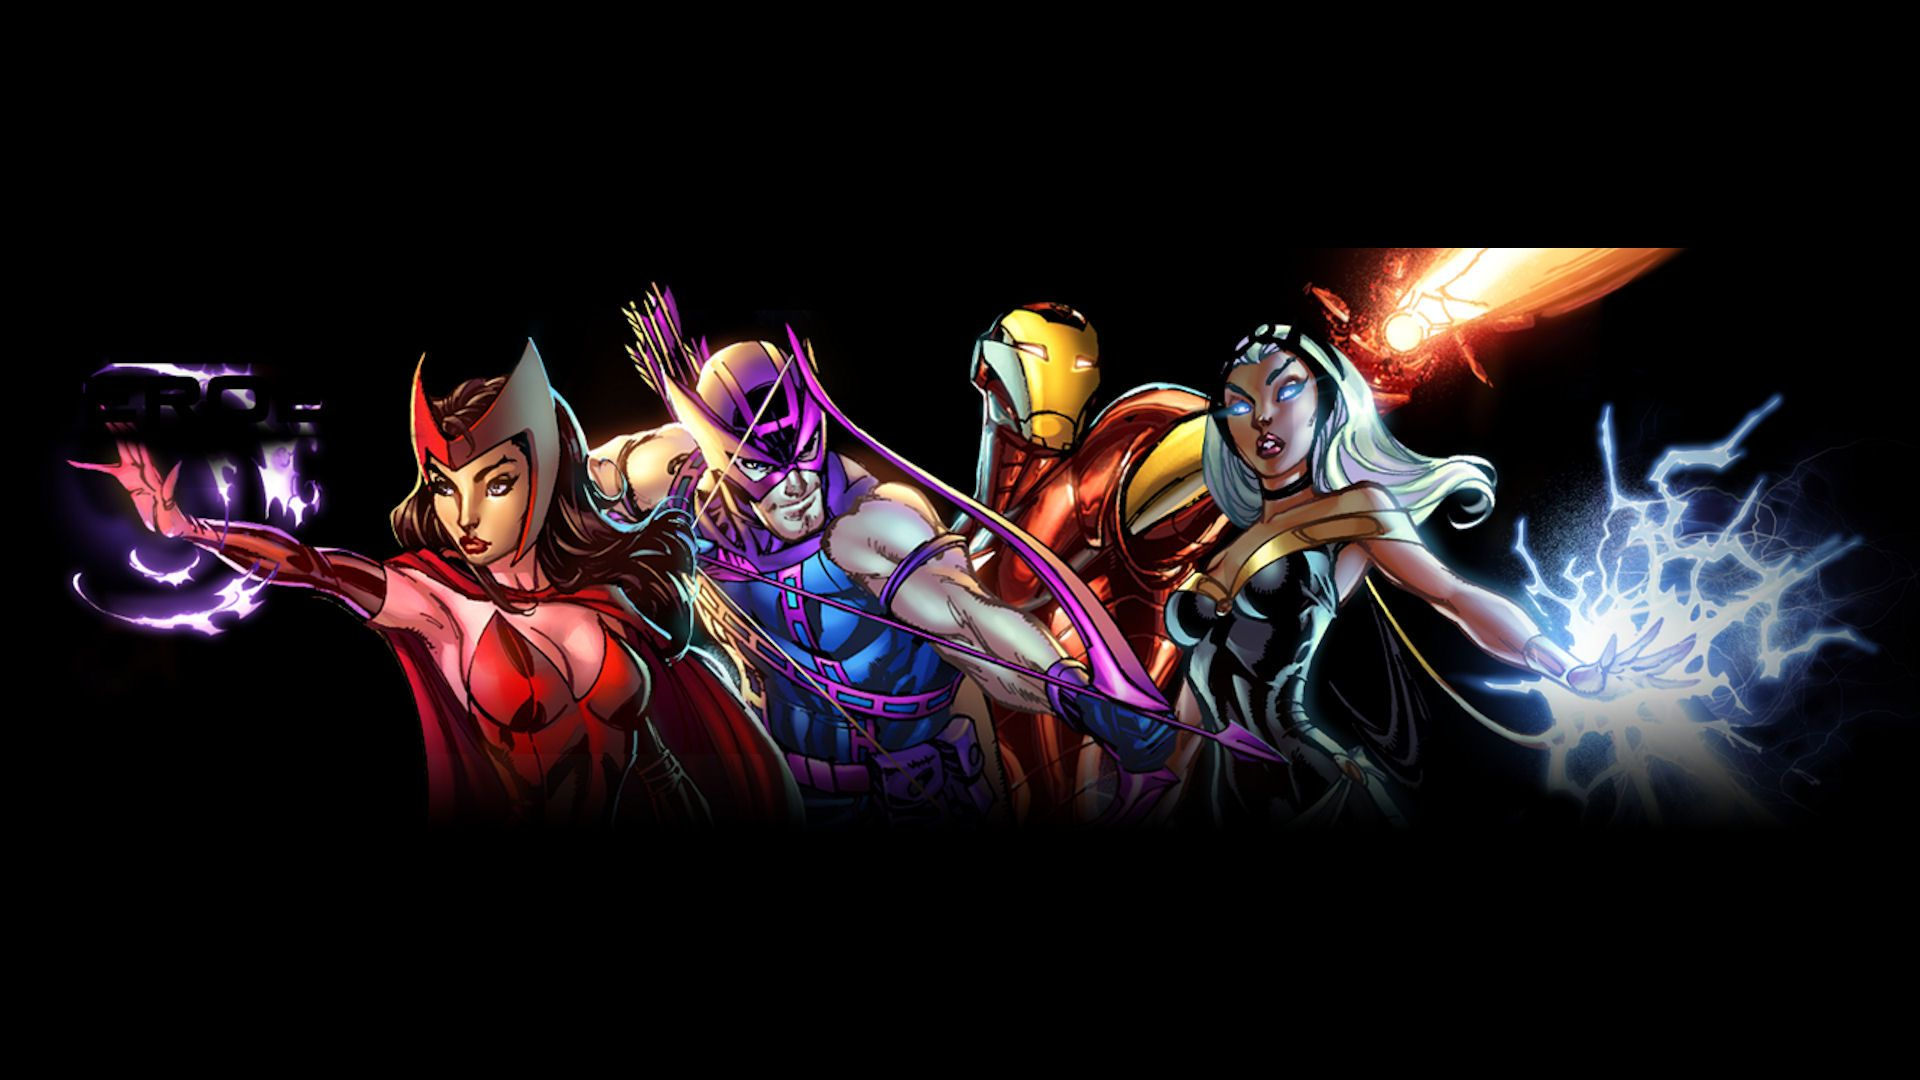 Marvel heroes wallpaper wallpapersafari - All marvel heroes wallpaper ...